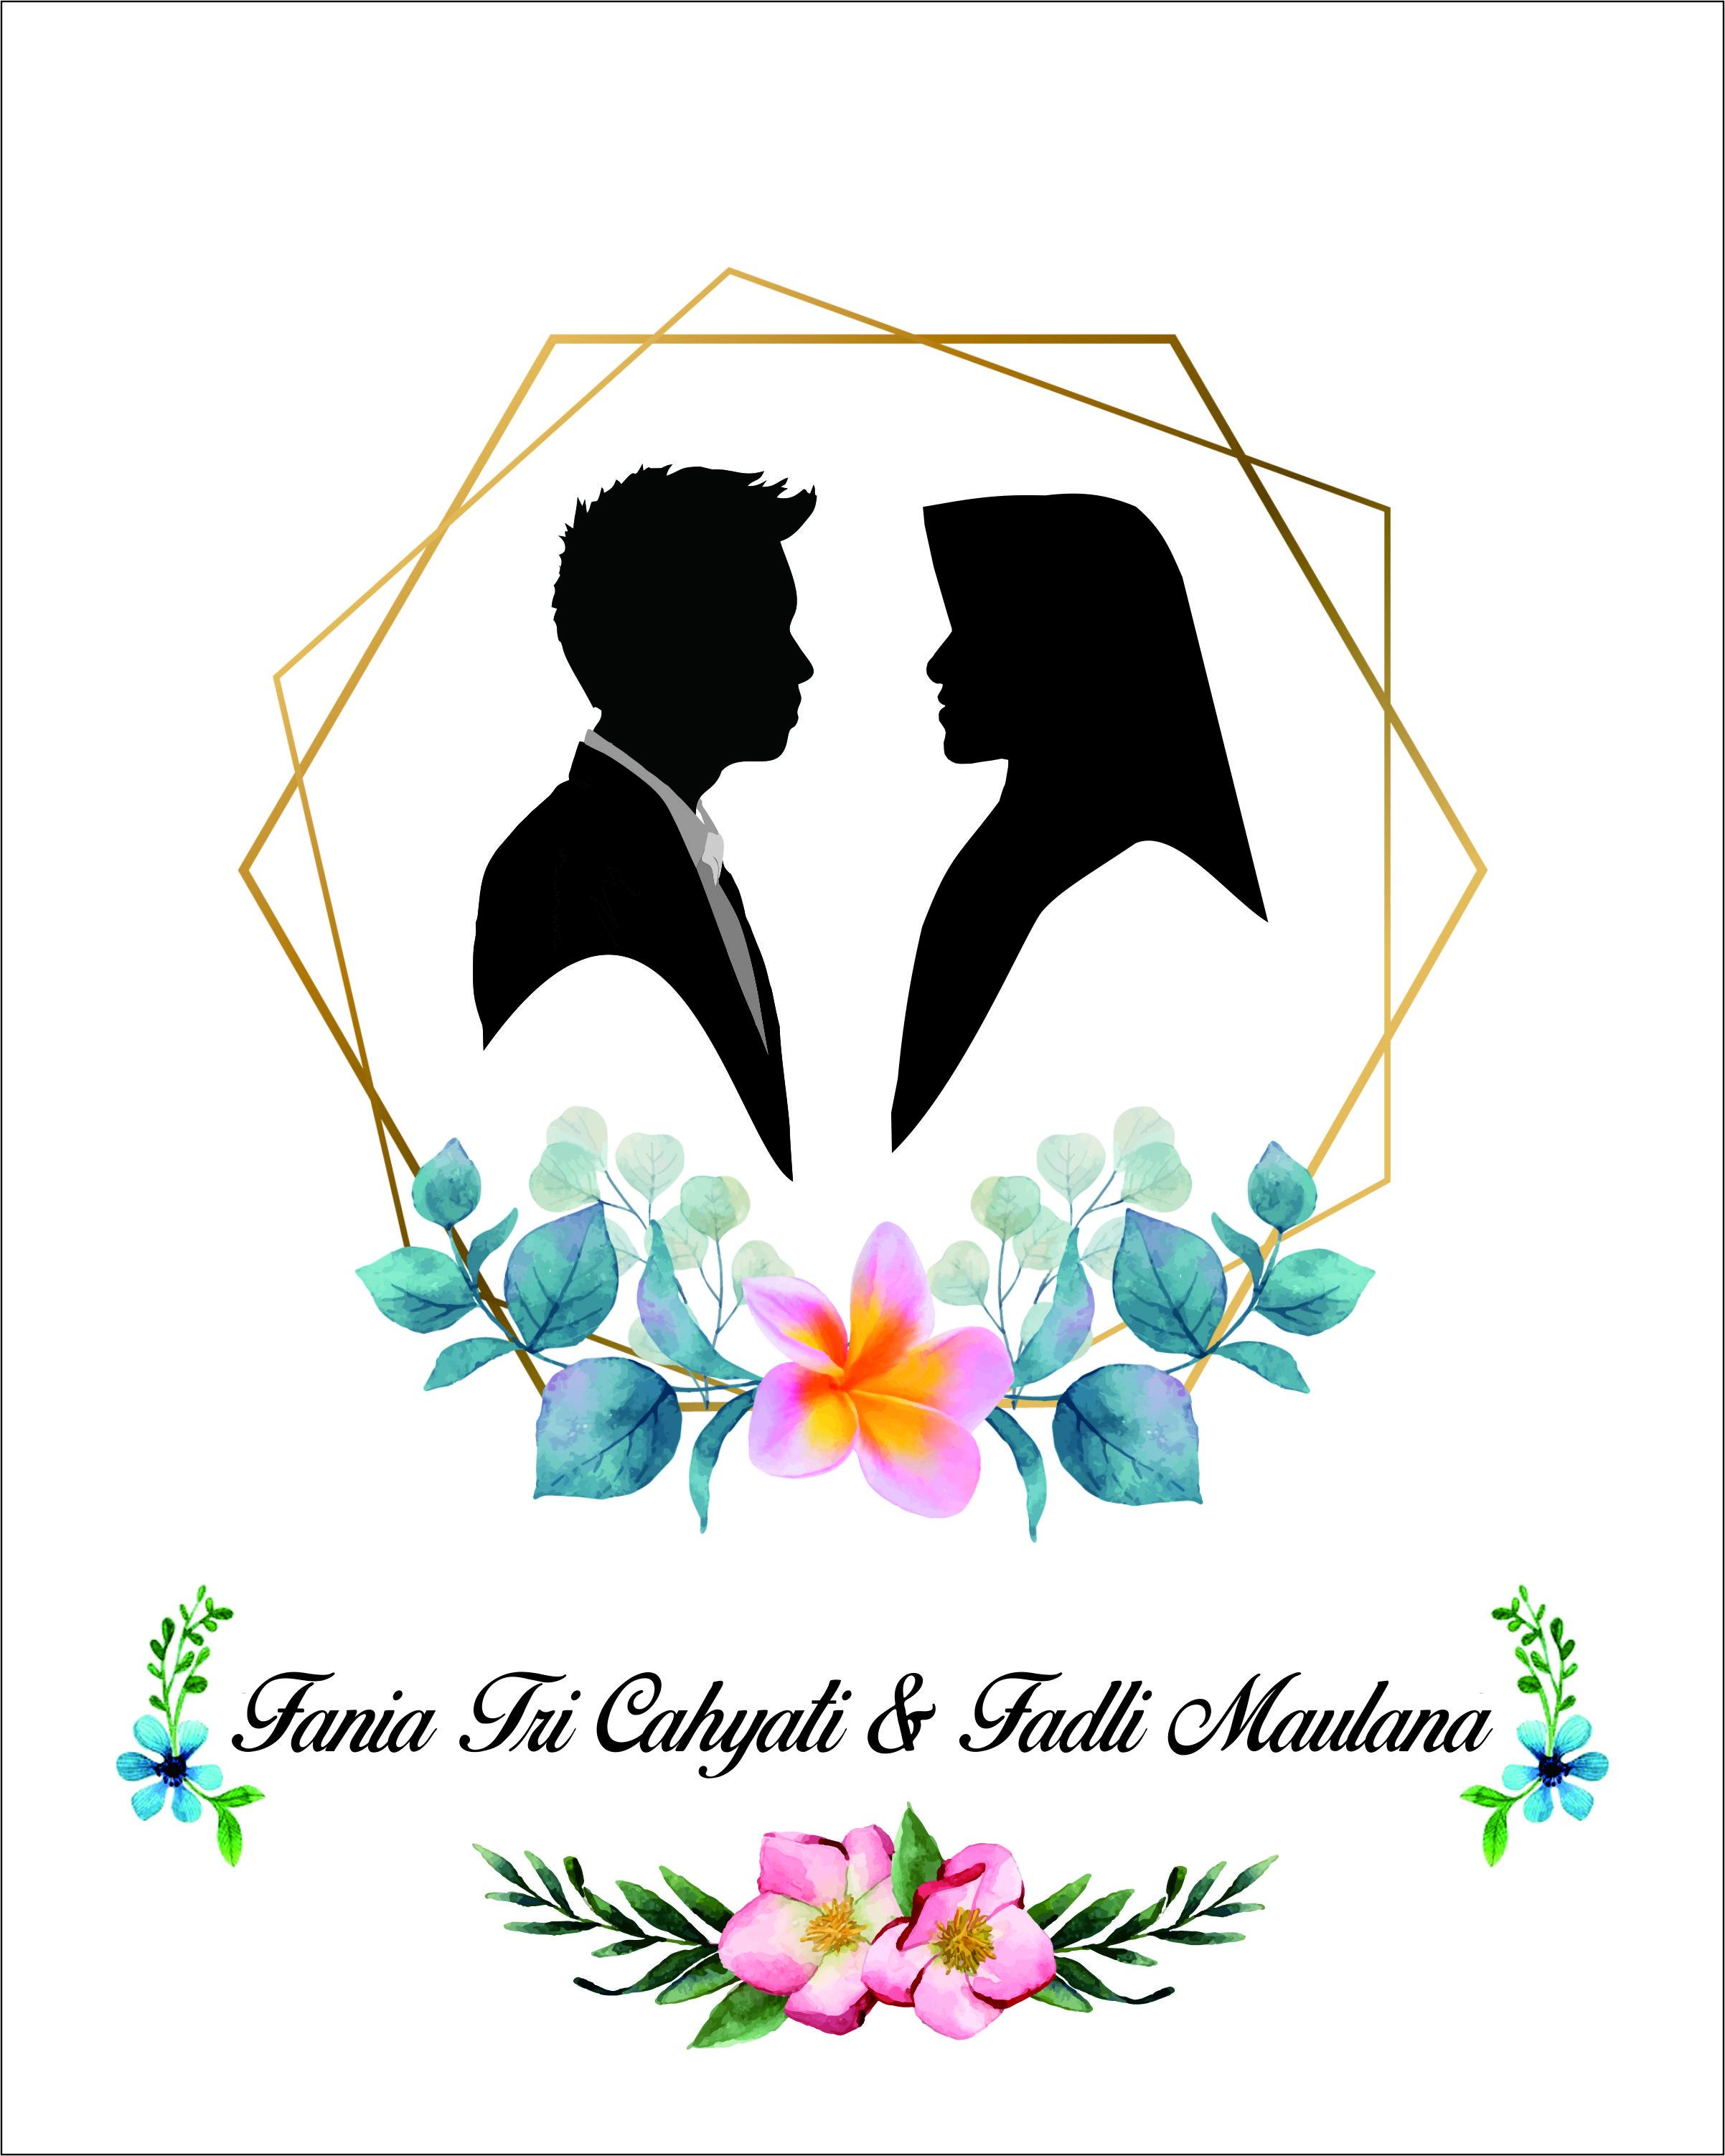 73 Gambar Animasi Undangan Pernikahan Paling Bagus